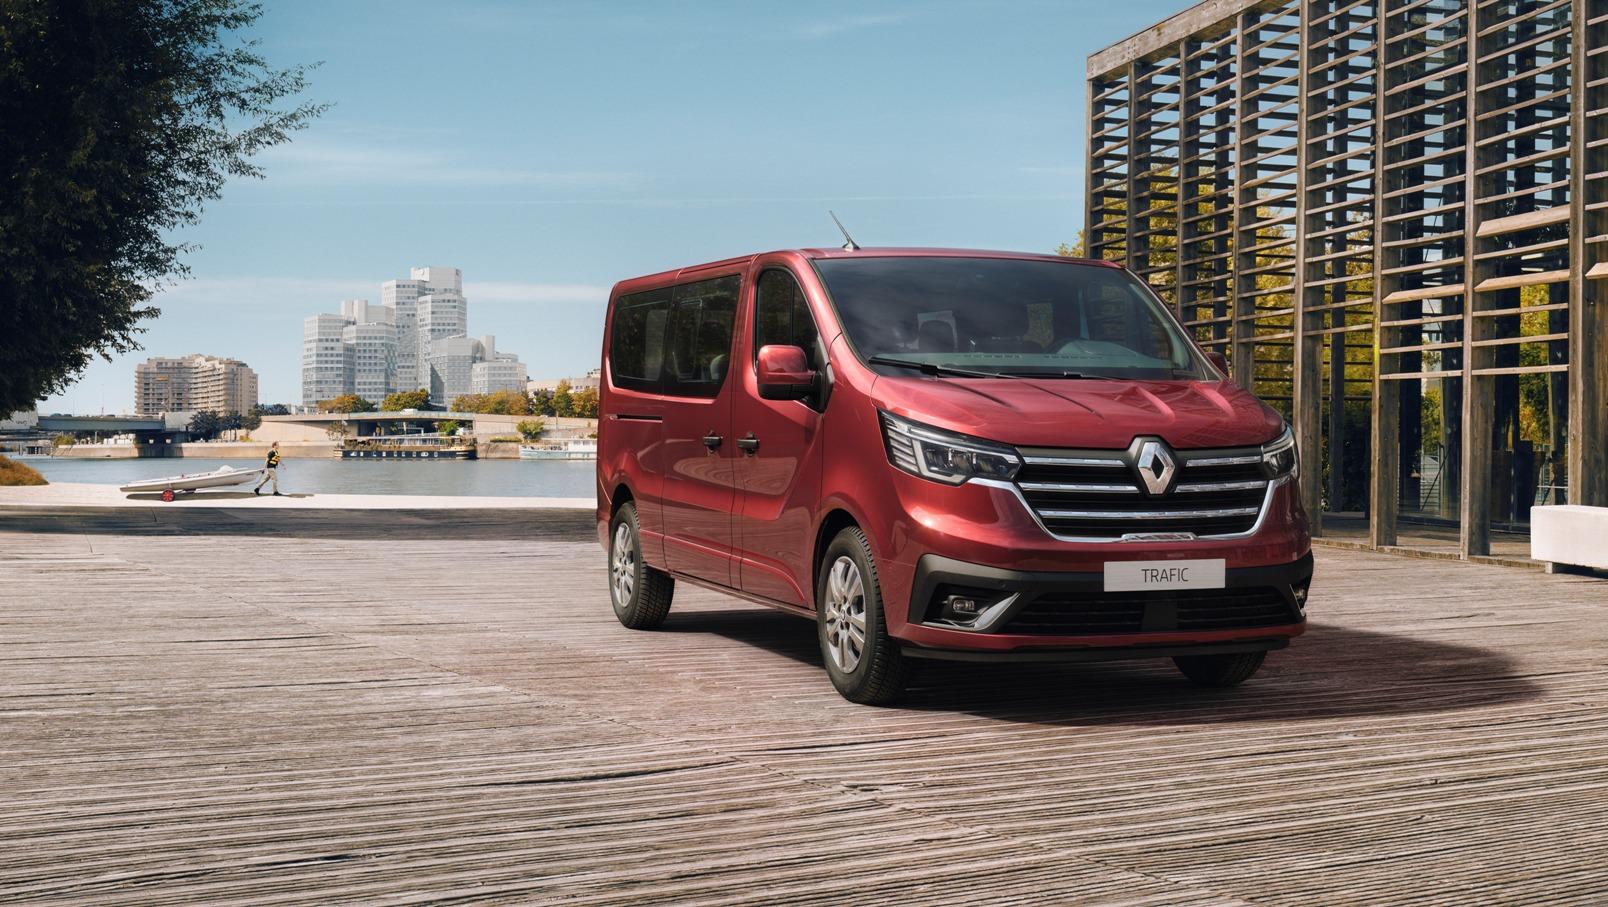 Renault Trafic Combi Spaceclass 2021 (1)